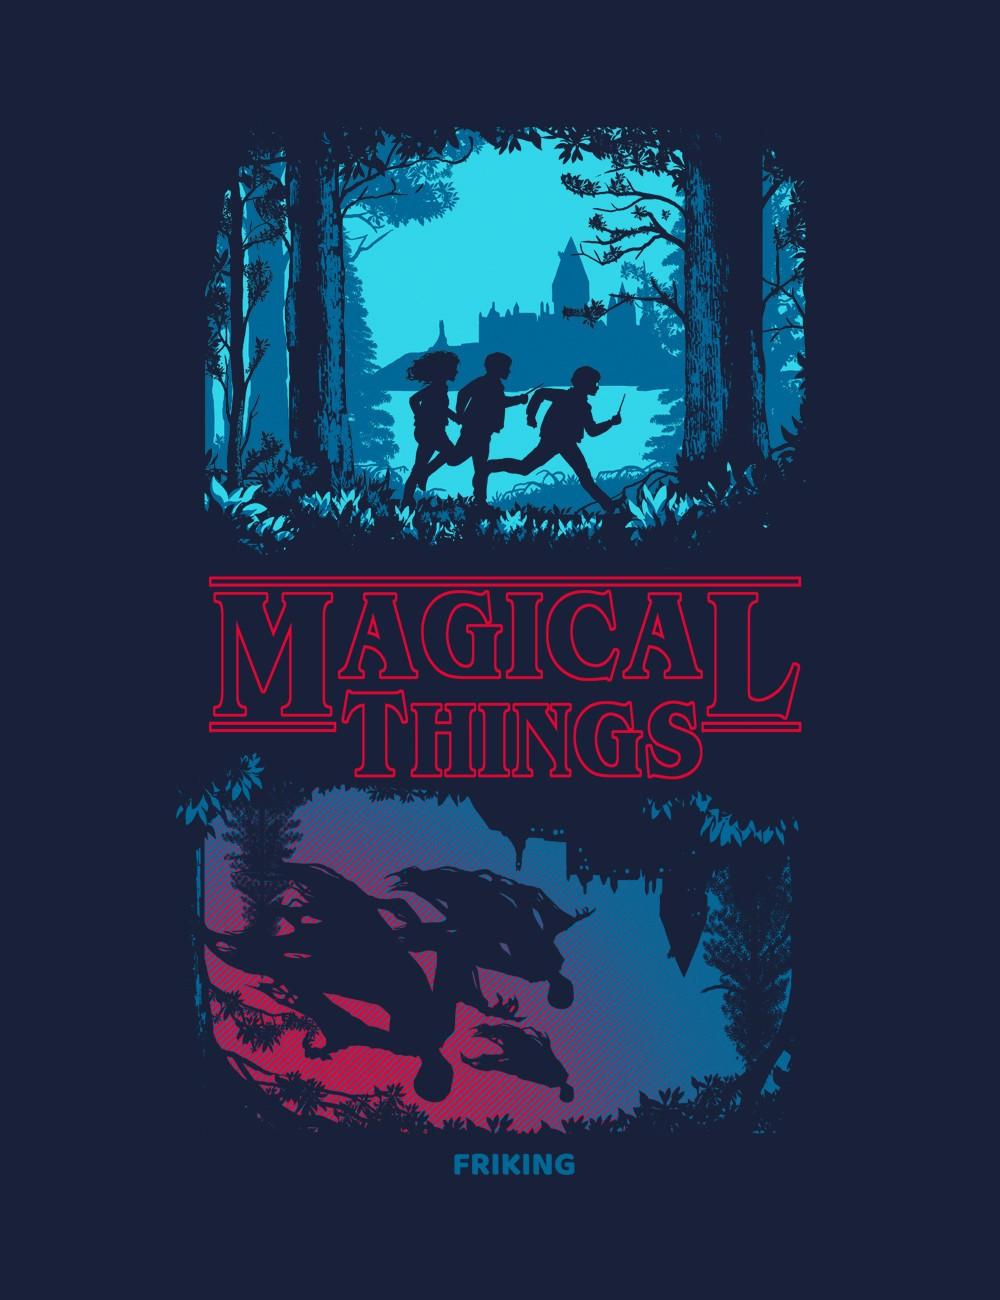 Magical Things